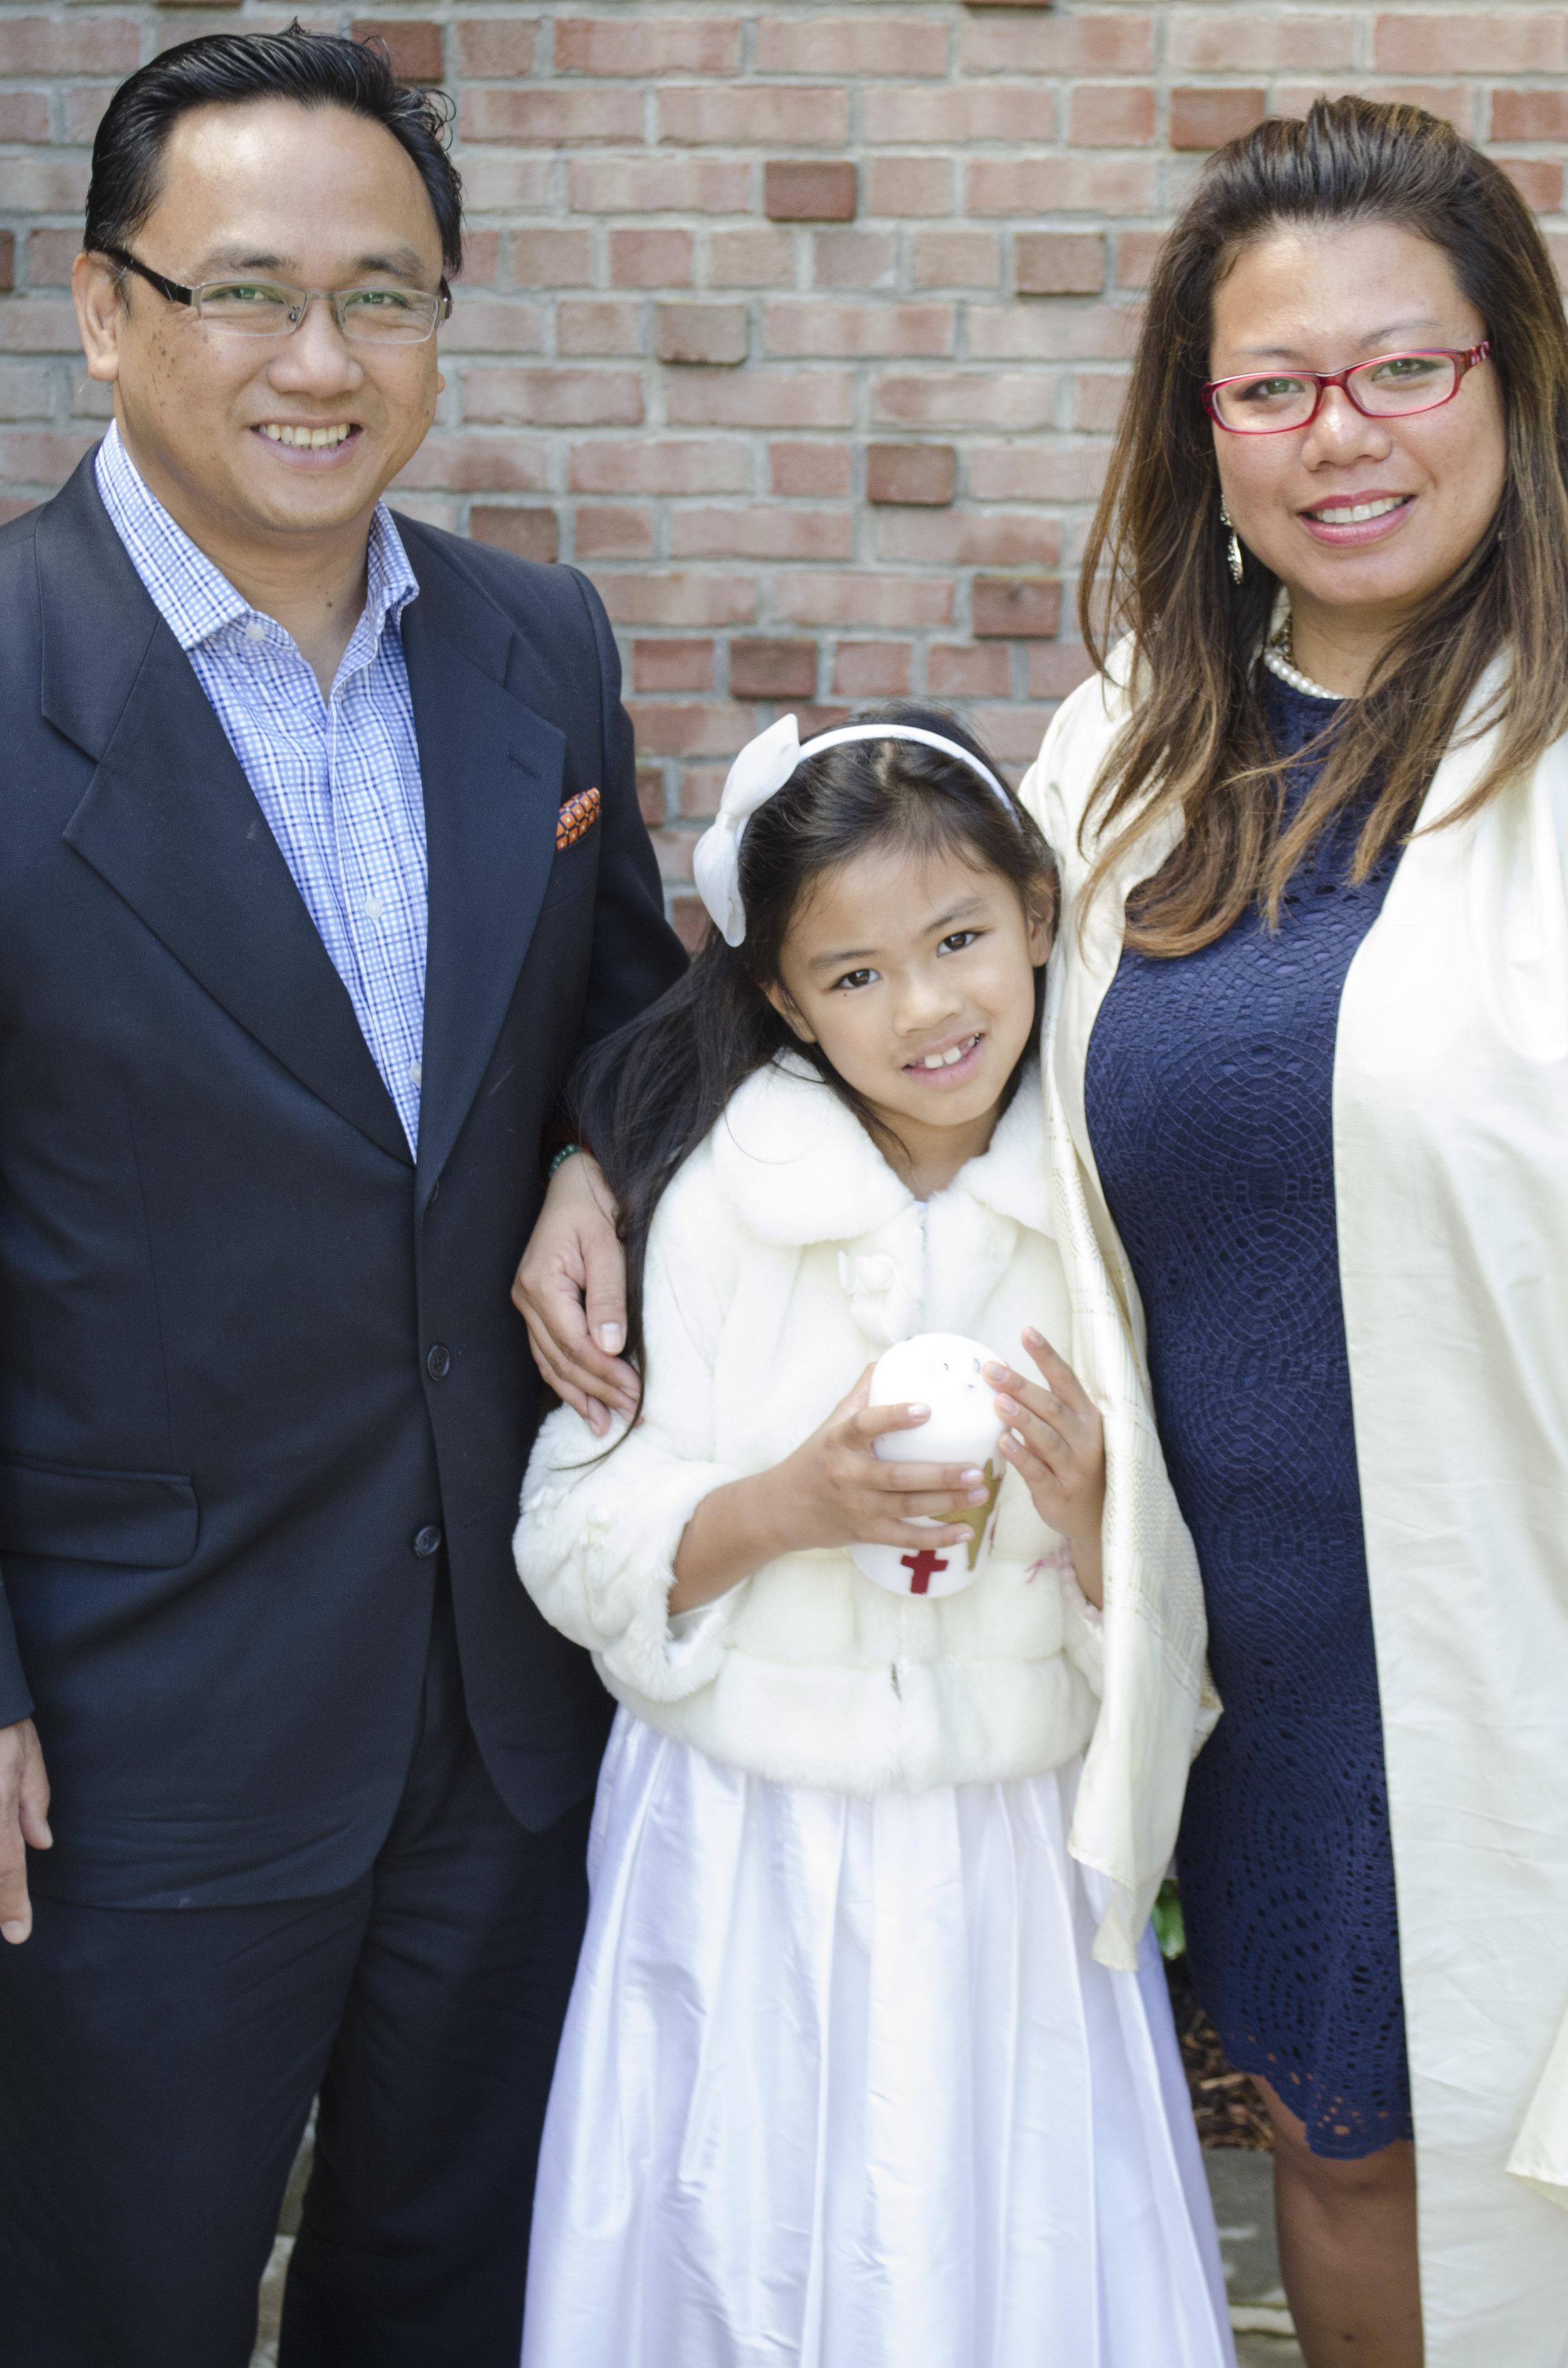 The_Family_at_the_church_2.jpg